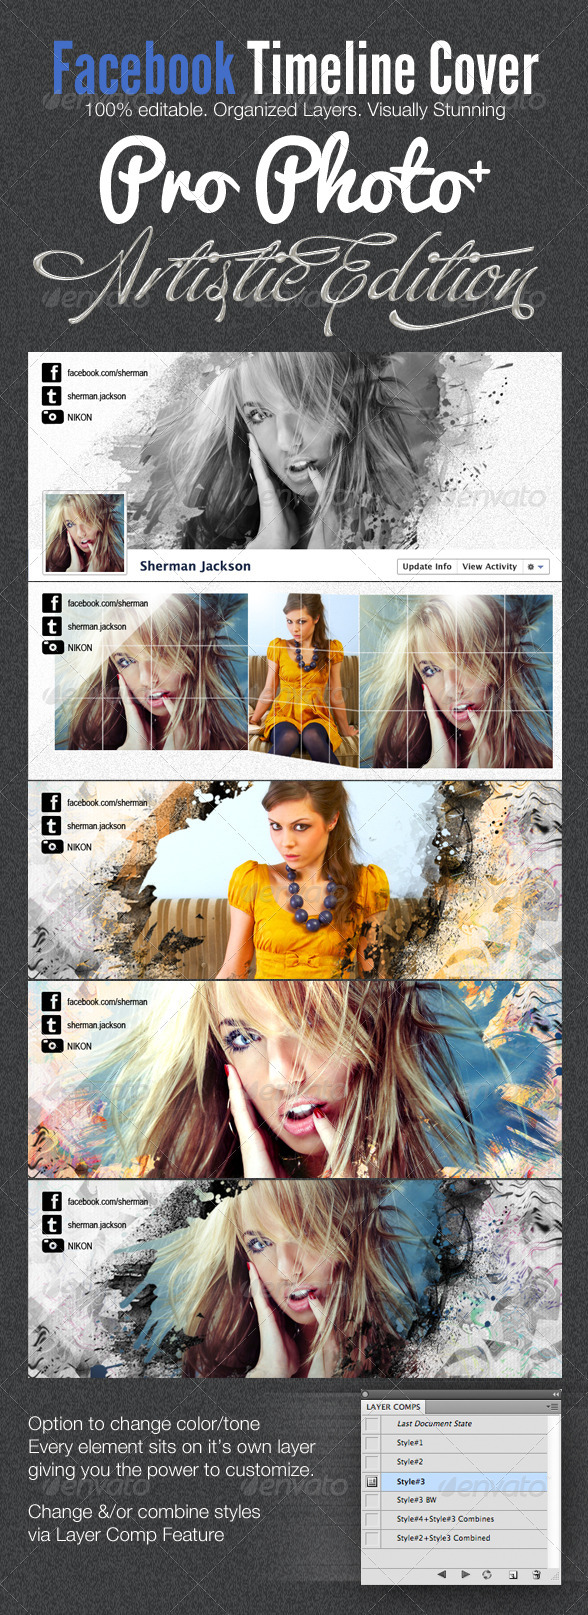 ProPhoto Artistic Facebook Timeline Cover Template - Facebook Timeline Covers Social Media